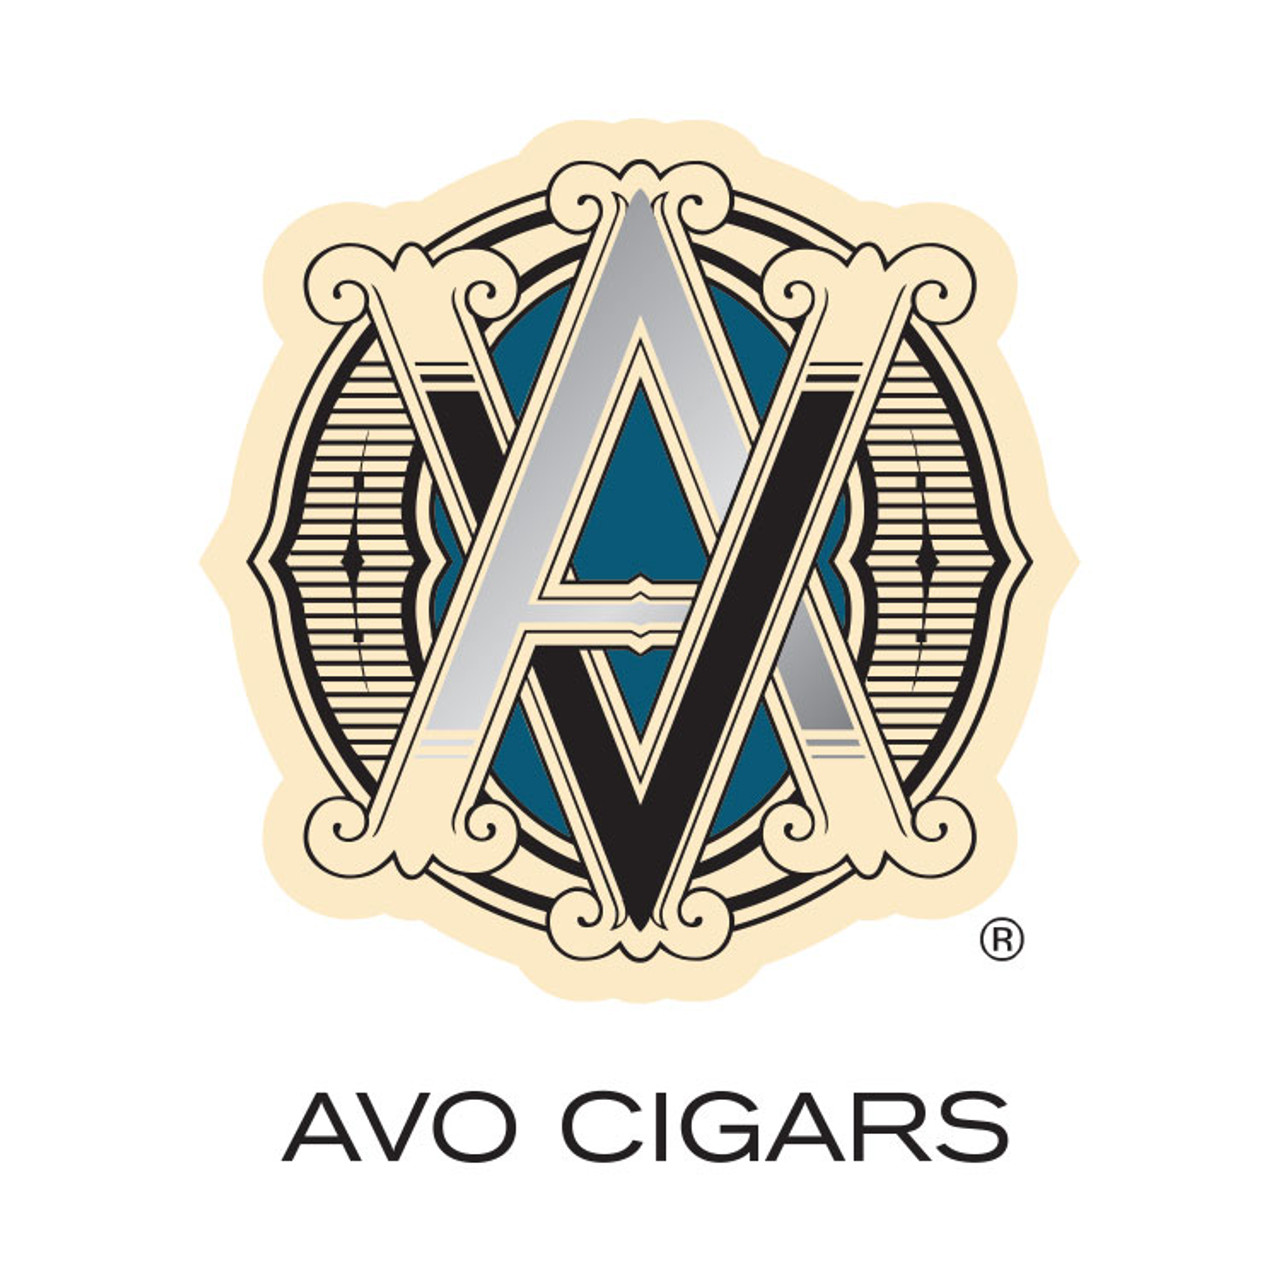 AVO Syncro Ritmo Toro Cigars - 6 x 54 (Box of 20)